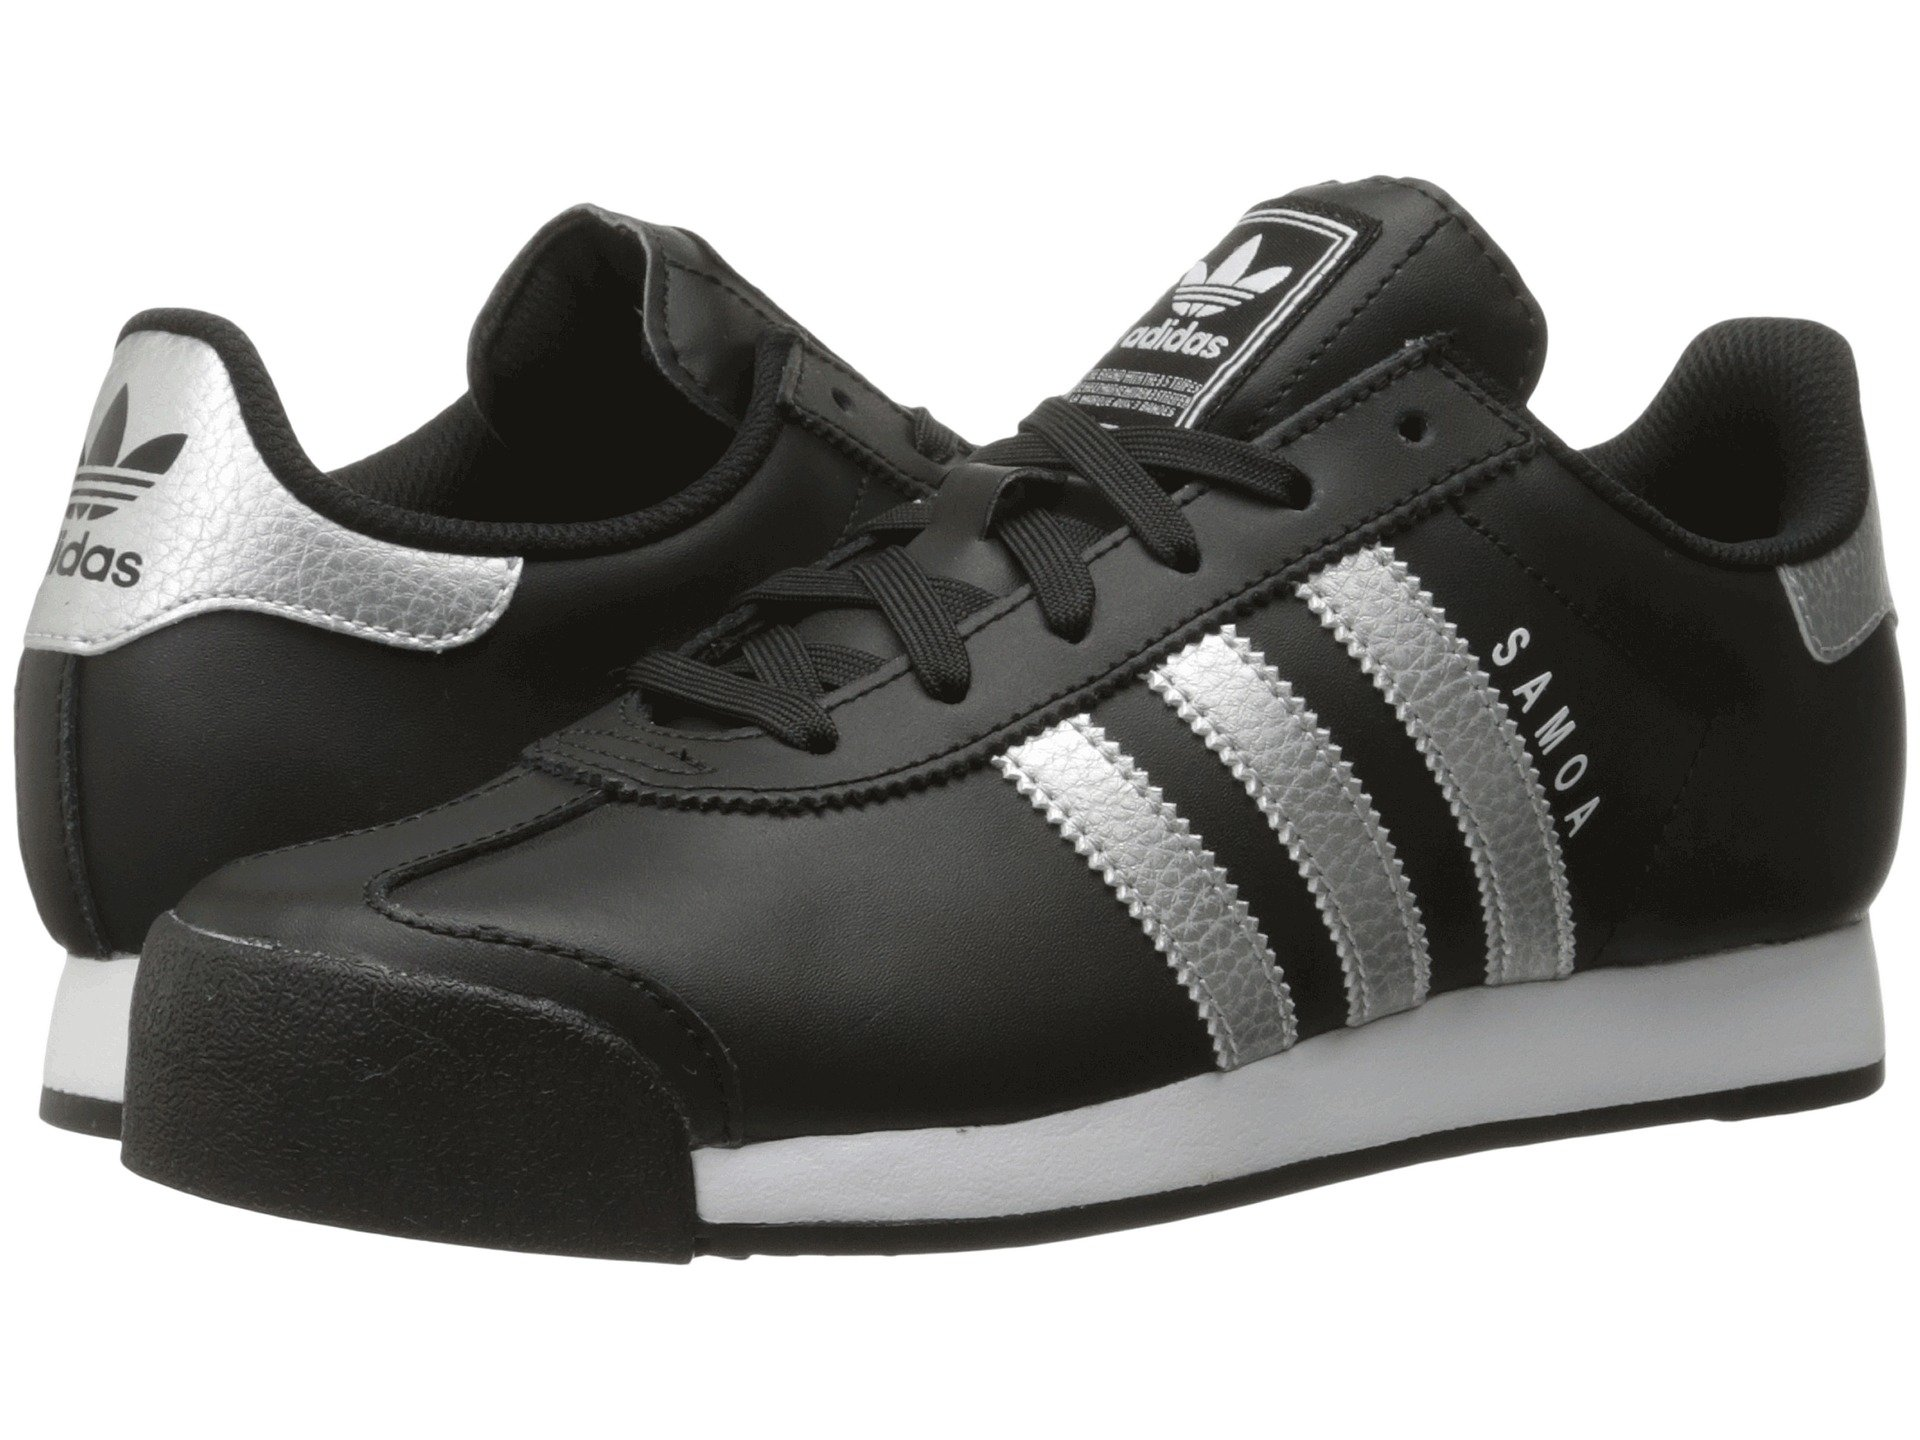 Adidas originali samoa cuoio, nucleo nero / argento metallico / calzature